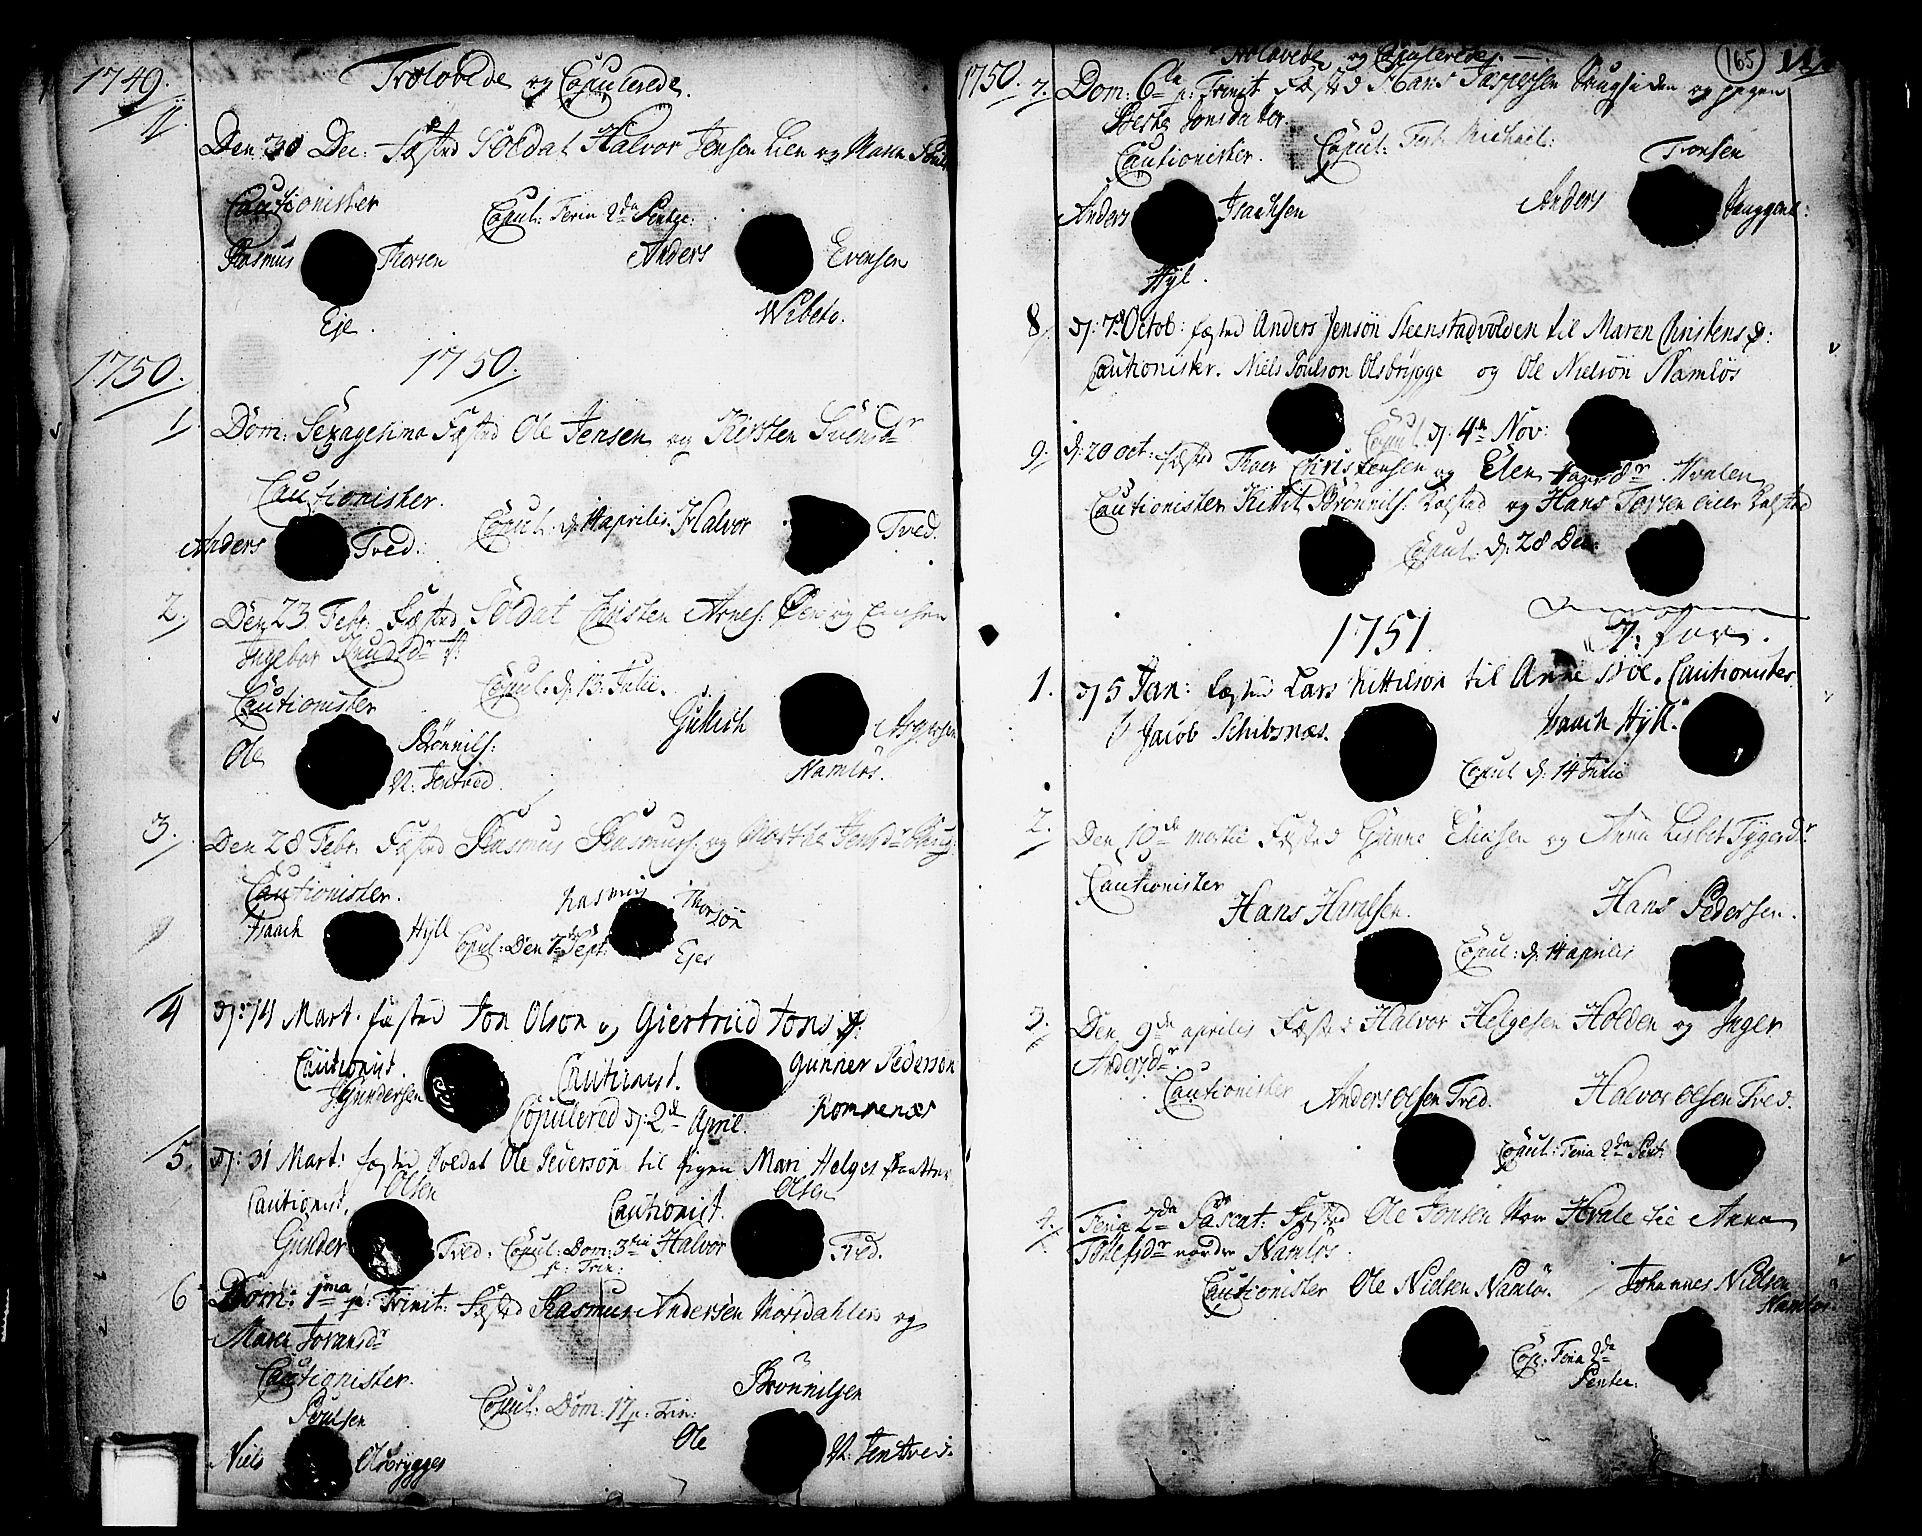 SAKO, Holla kirkebøker, F/Fa/L0001: Ministerialbok nr. 1, 1717-1779, s. 165